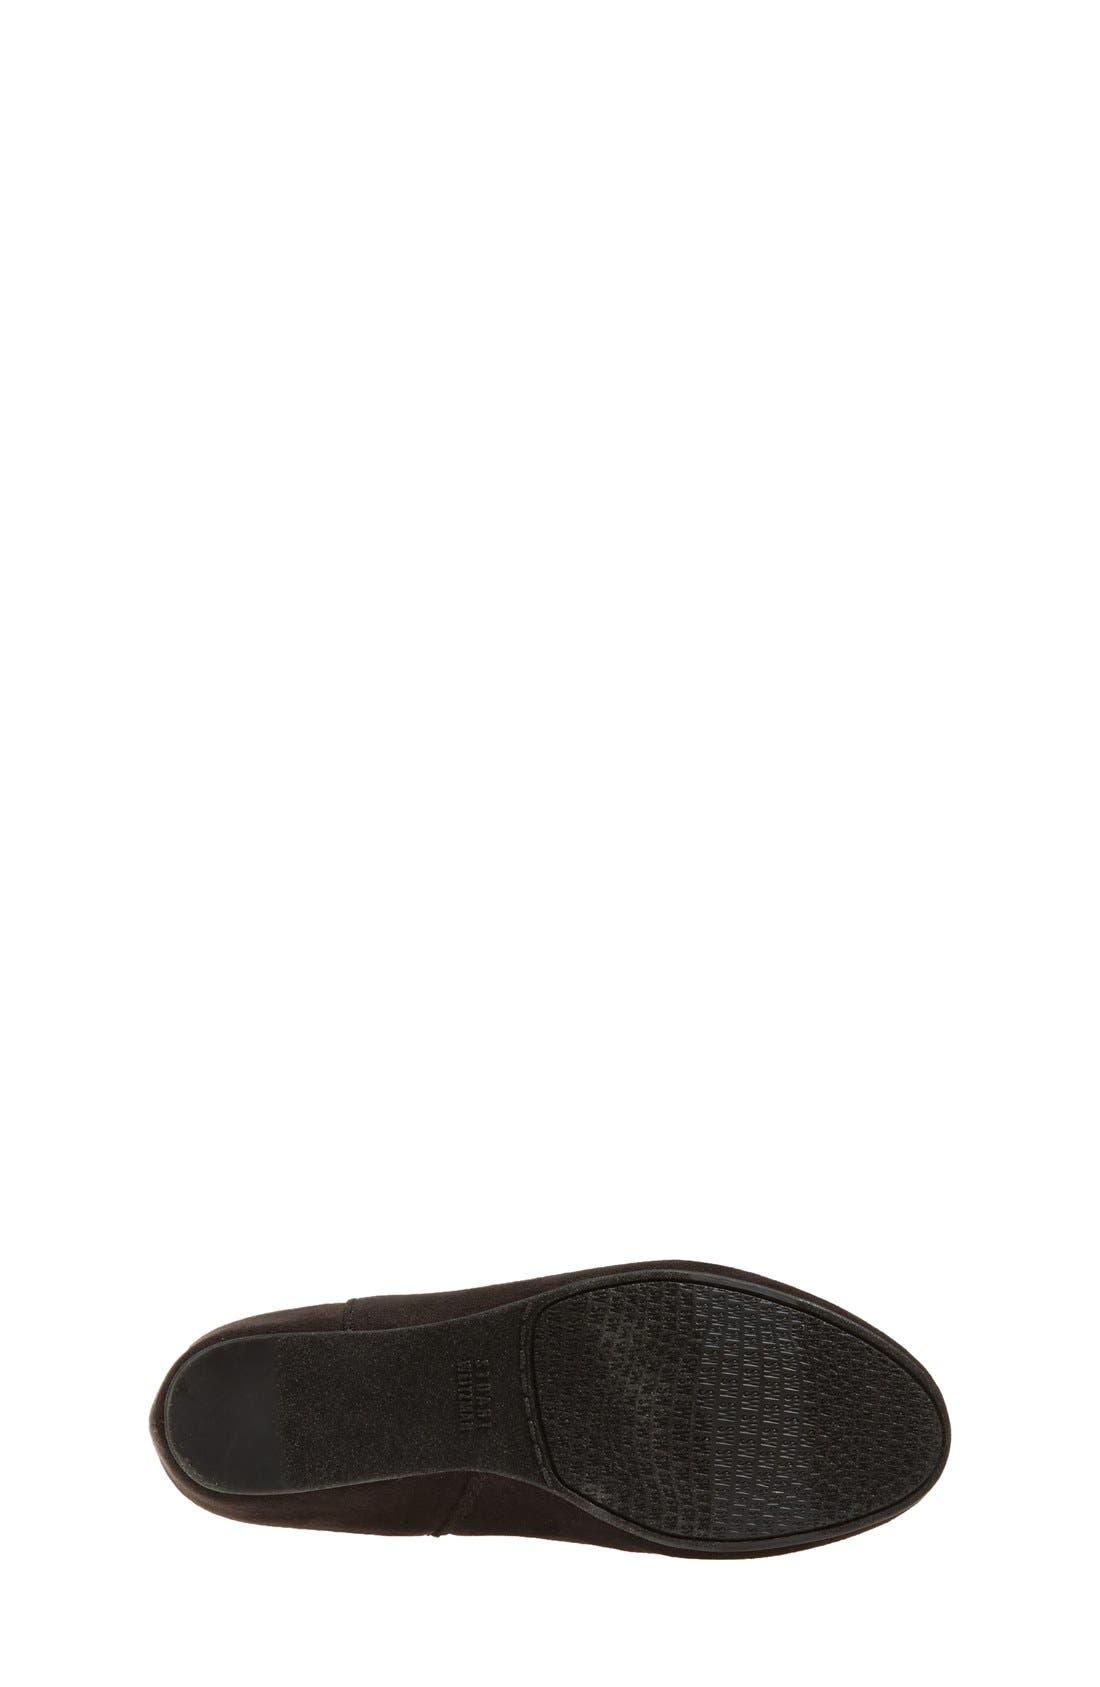 'Iselle' Bow Boot,                             Alternate thumbnail 4, color,                             Black